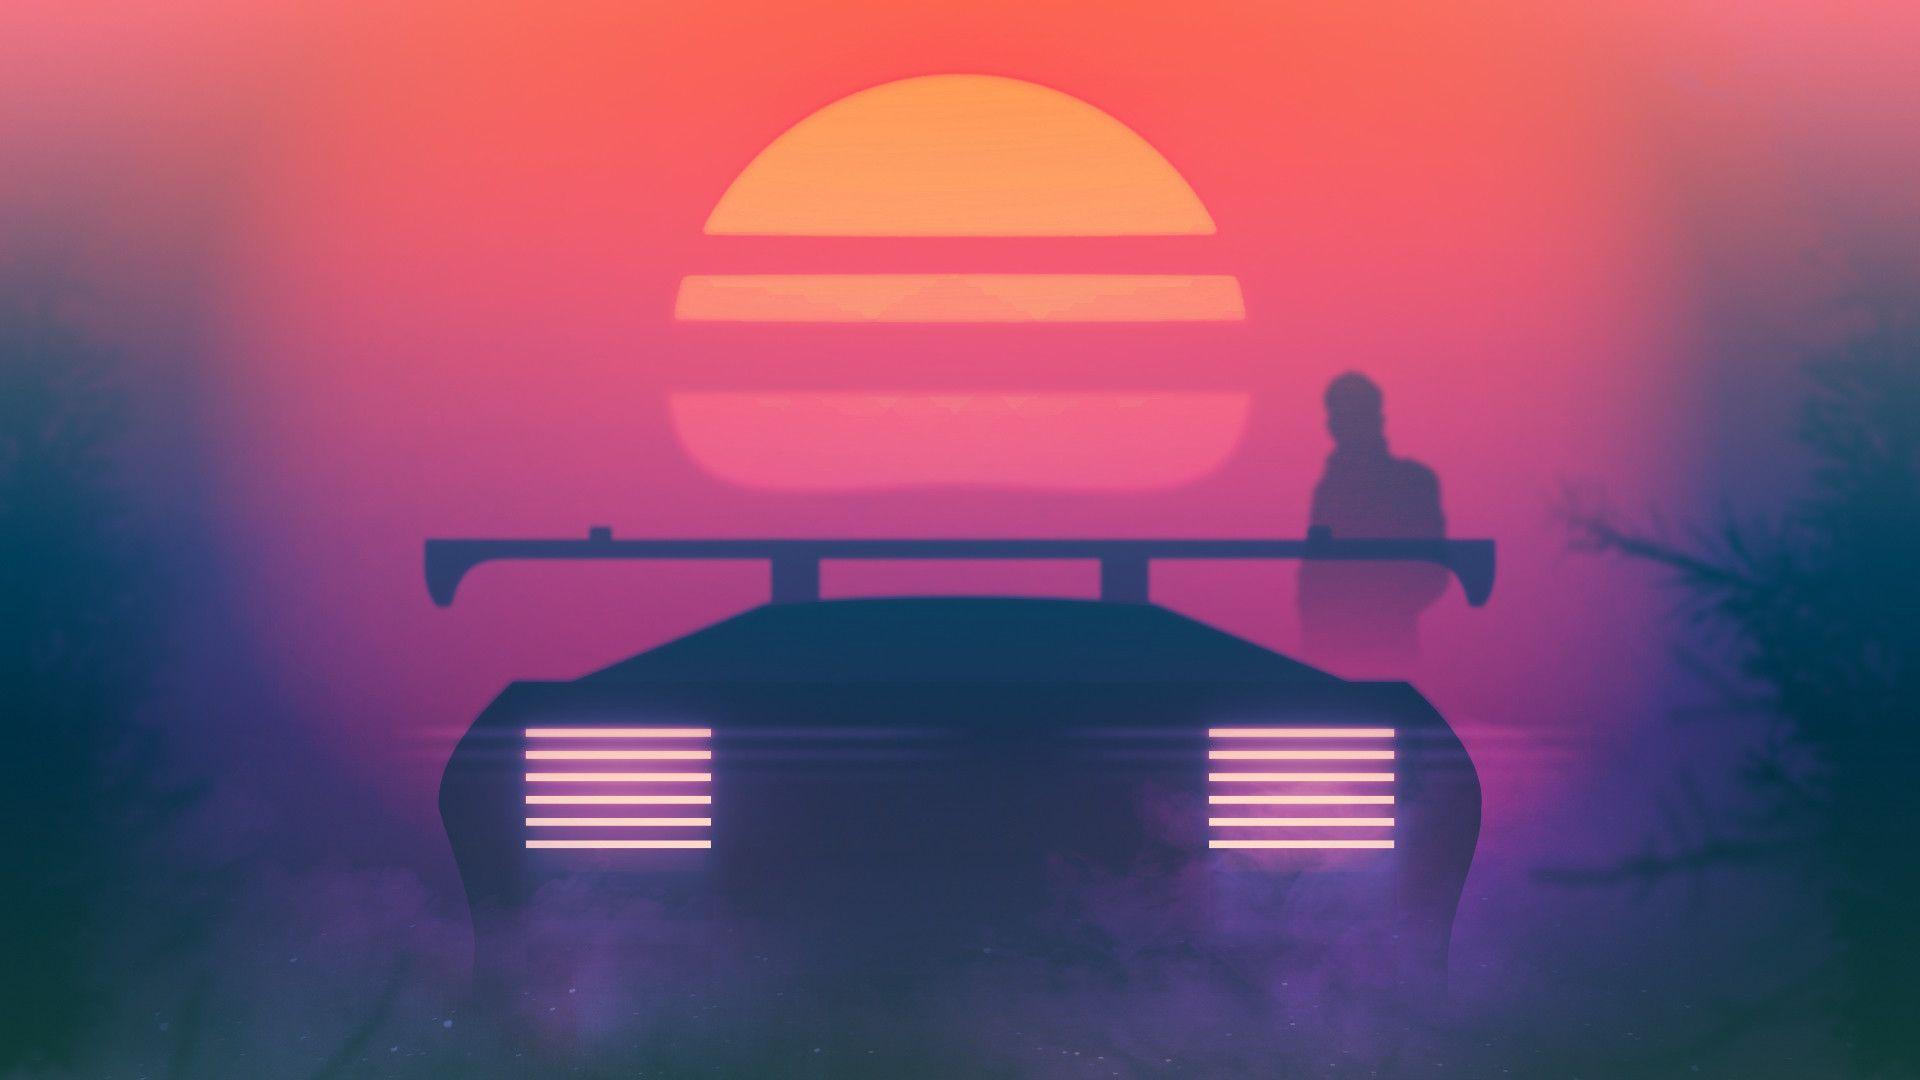 Journey [1920x1080] Retro waves Synthwave Retro futurism 1920x1080